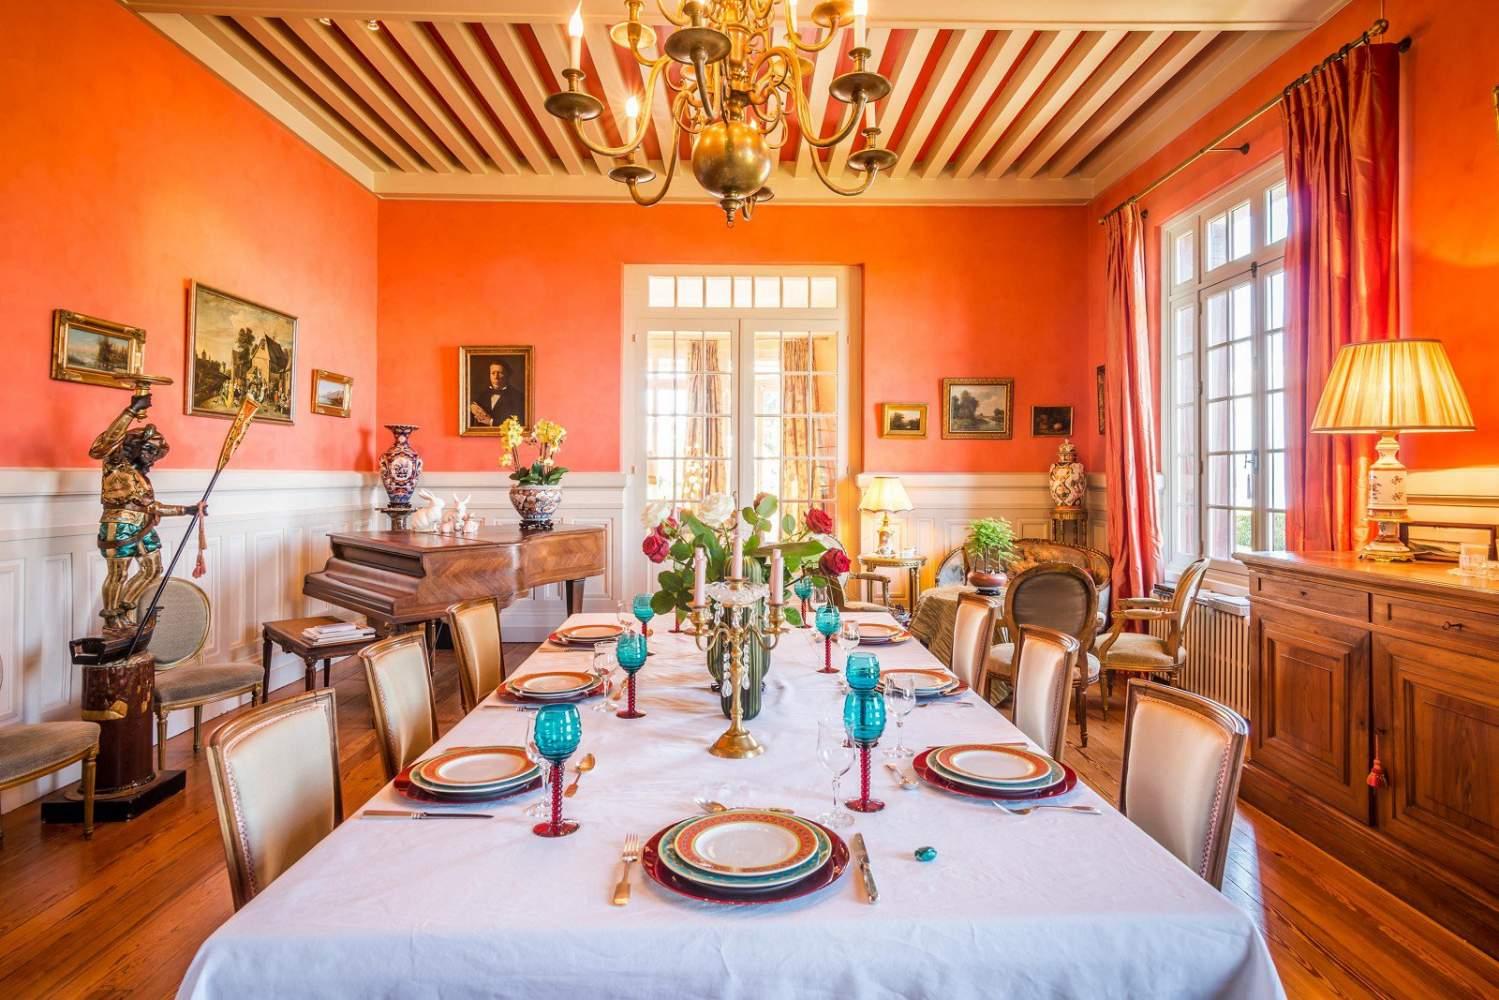 Thonon-les-Bains  - Casa 16 Cuartos 10 Habitaciones - picture 6